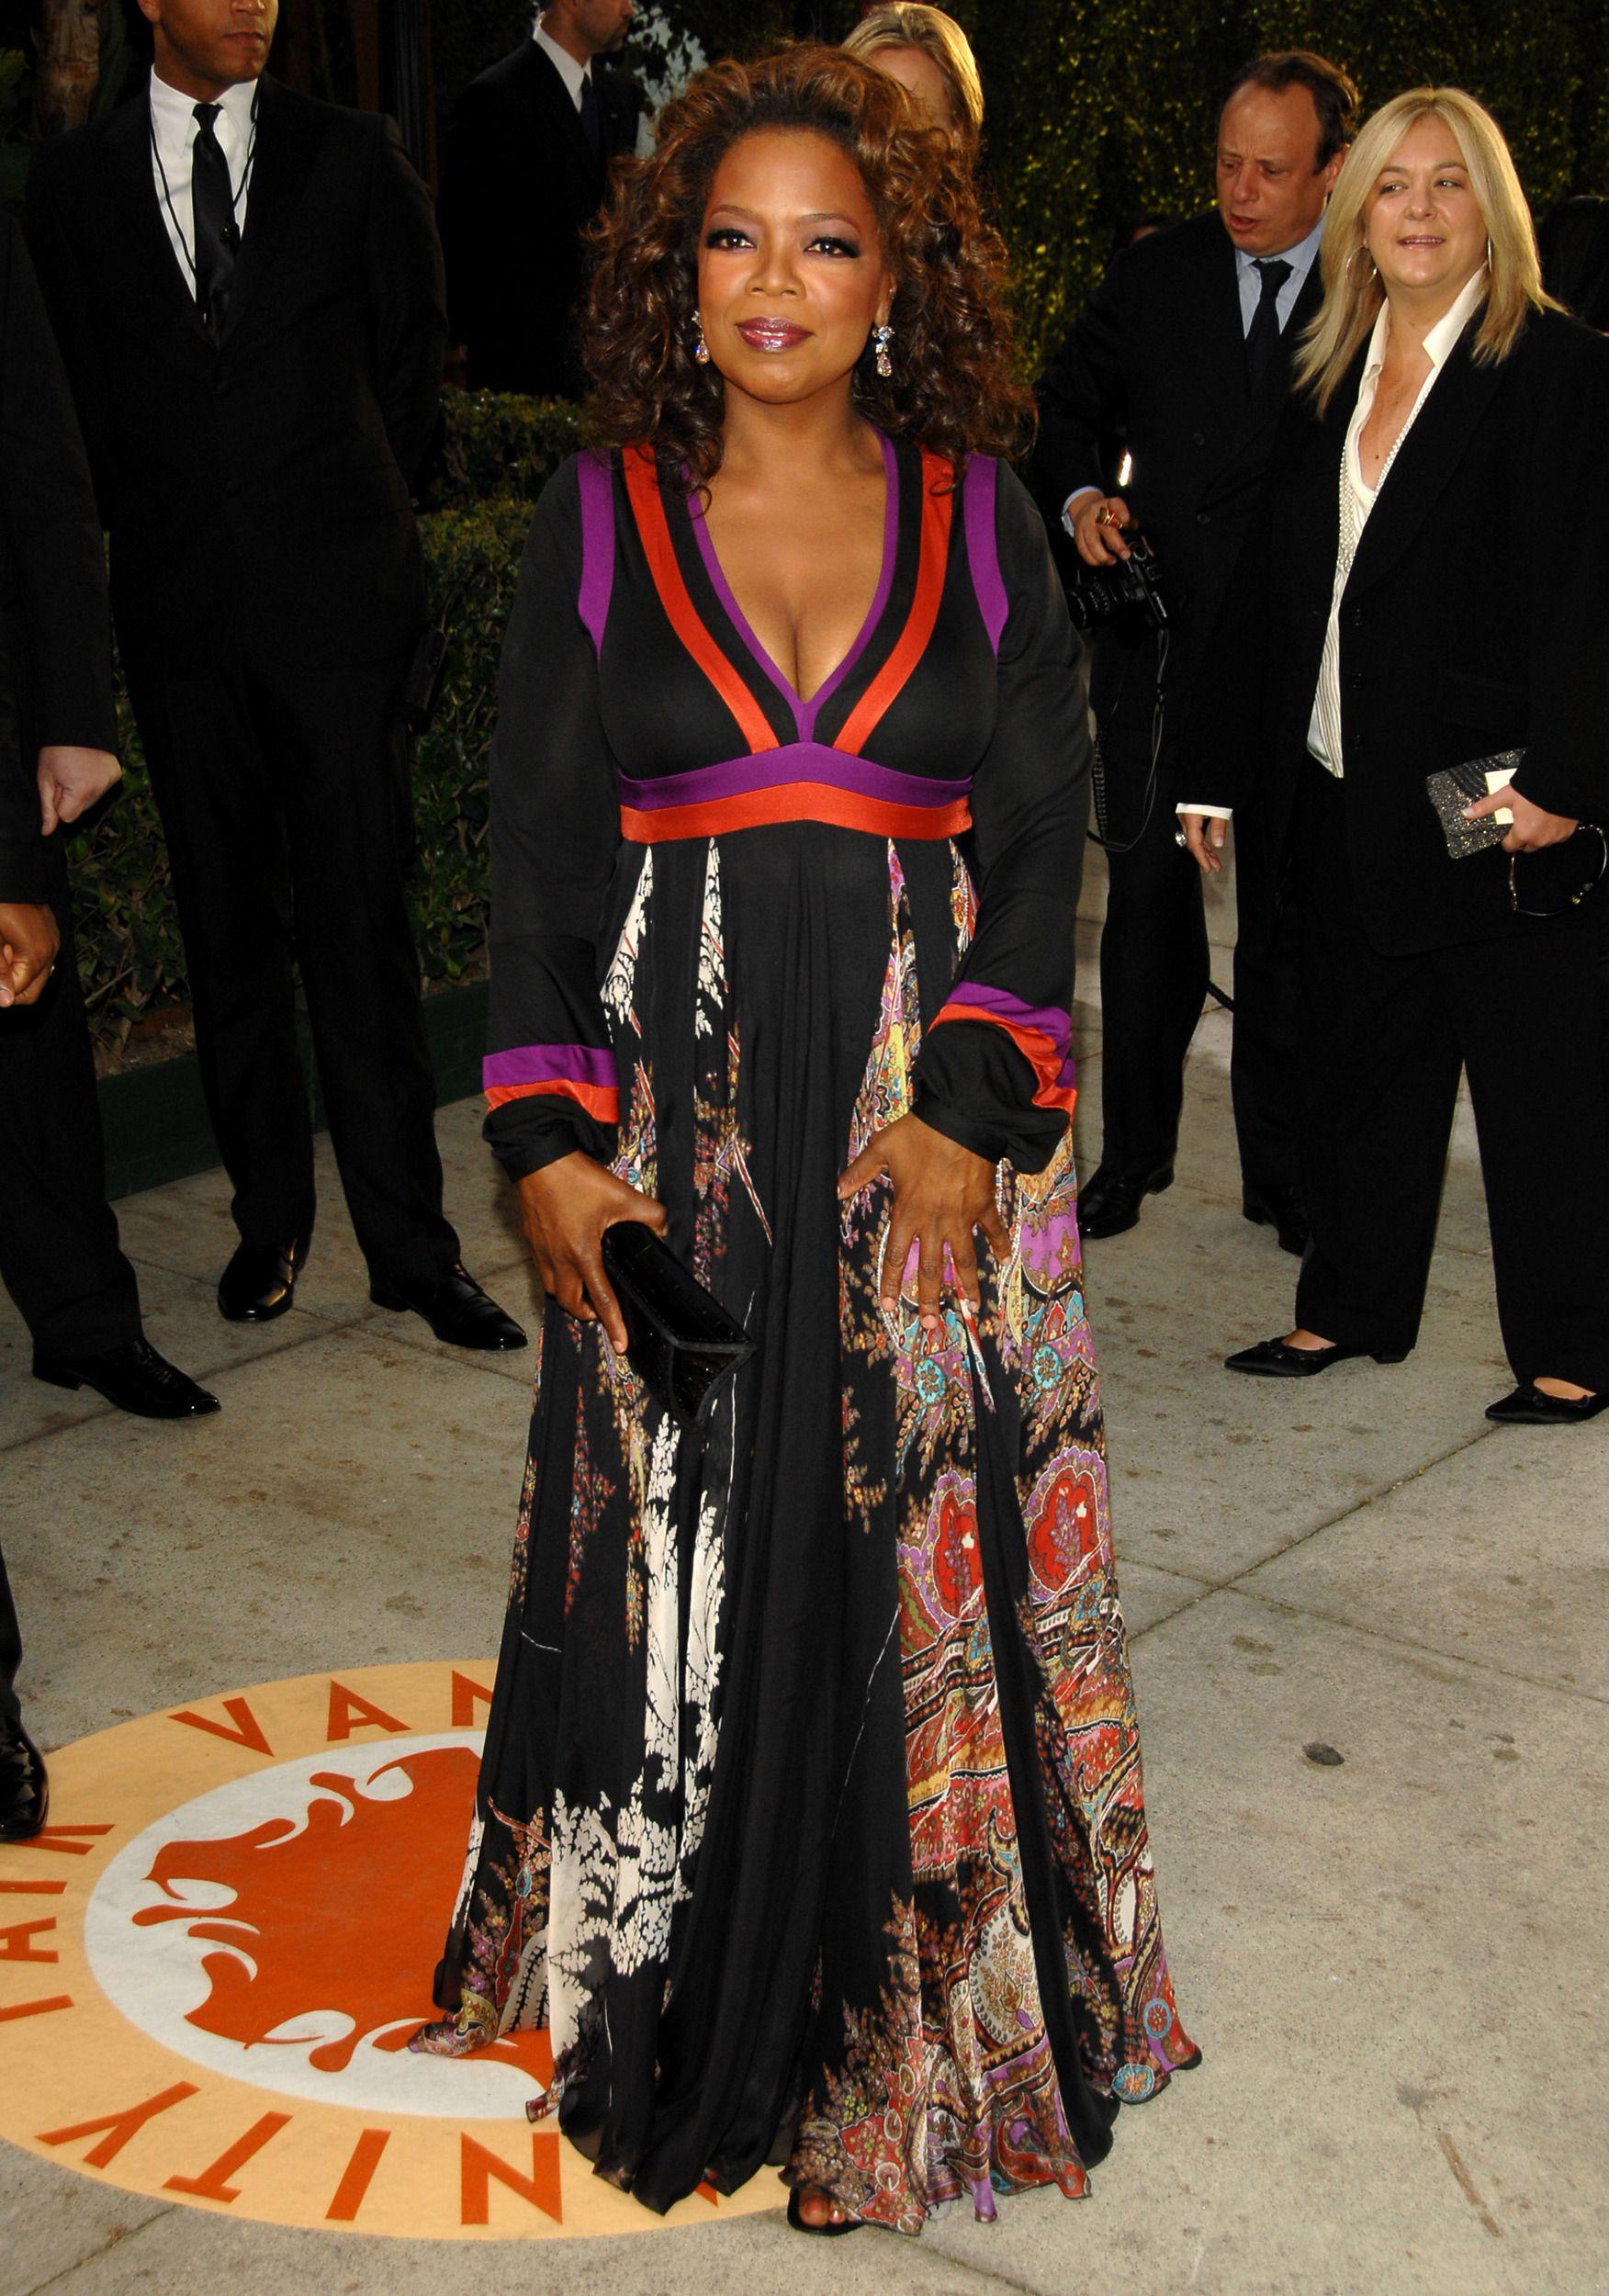 Oprah wedding dresses  Oprah Winfrey attends the  Vanity Fair Oscar Party via